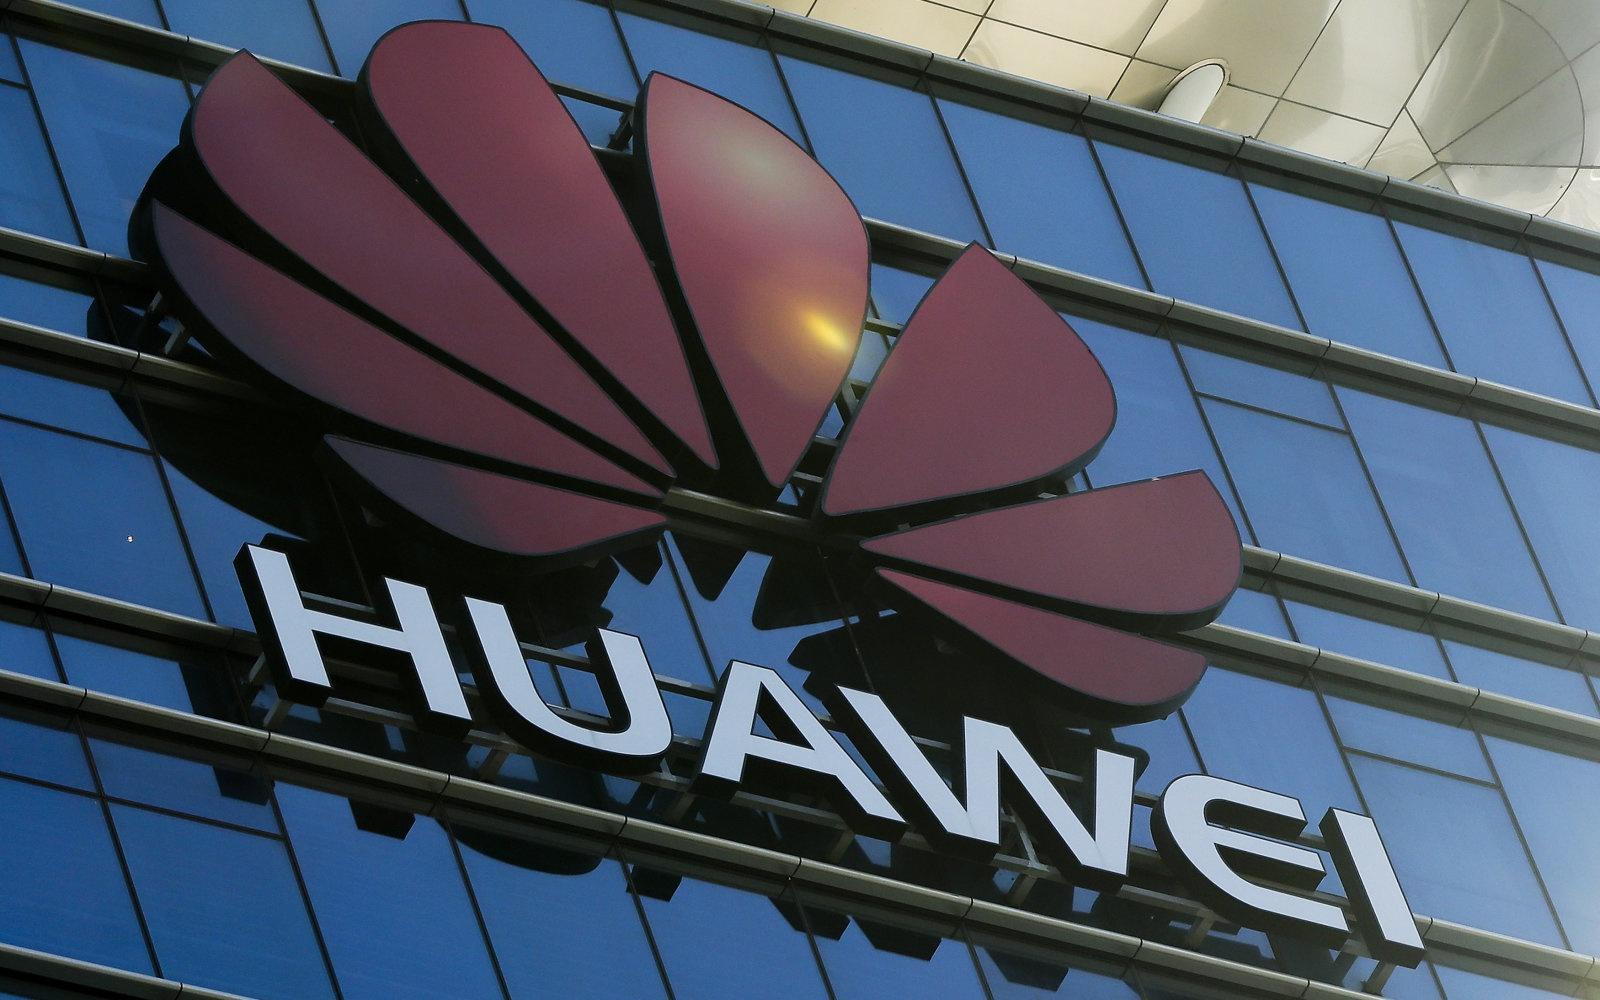 Ro ri tai lieu Huawei giup Iran hinh anh 2 dims.jpg